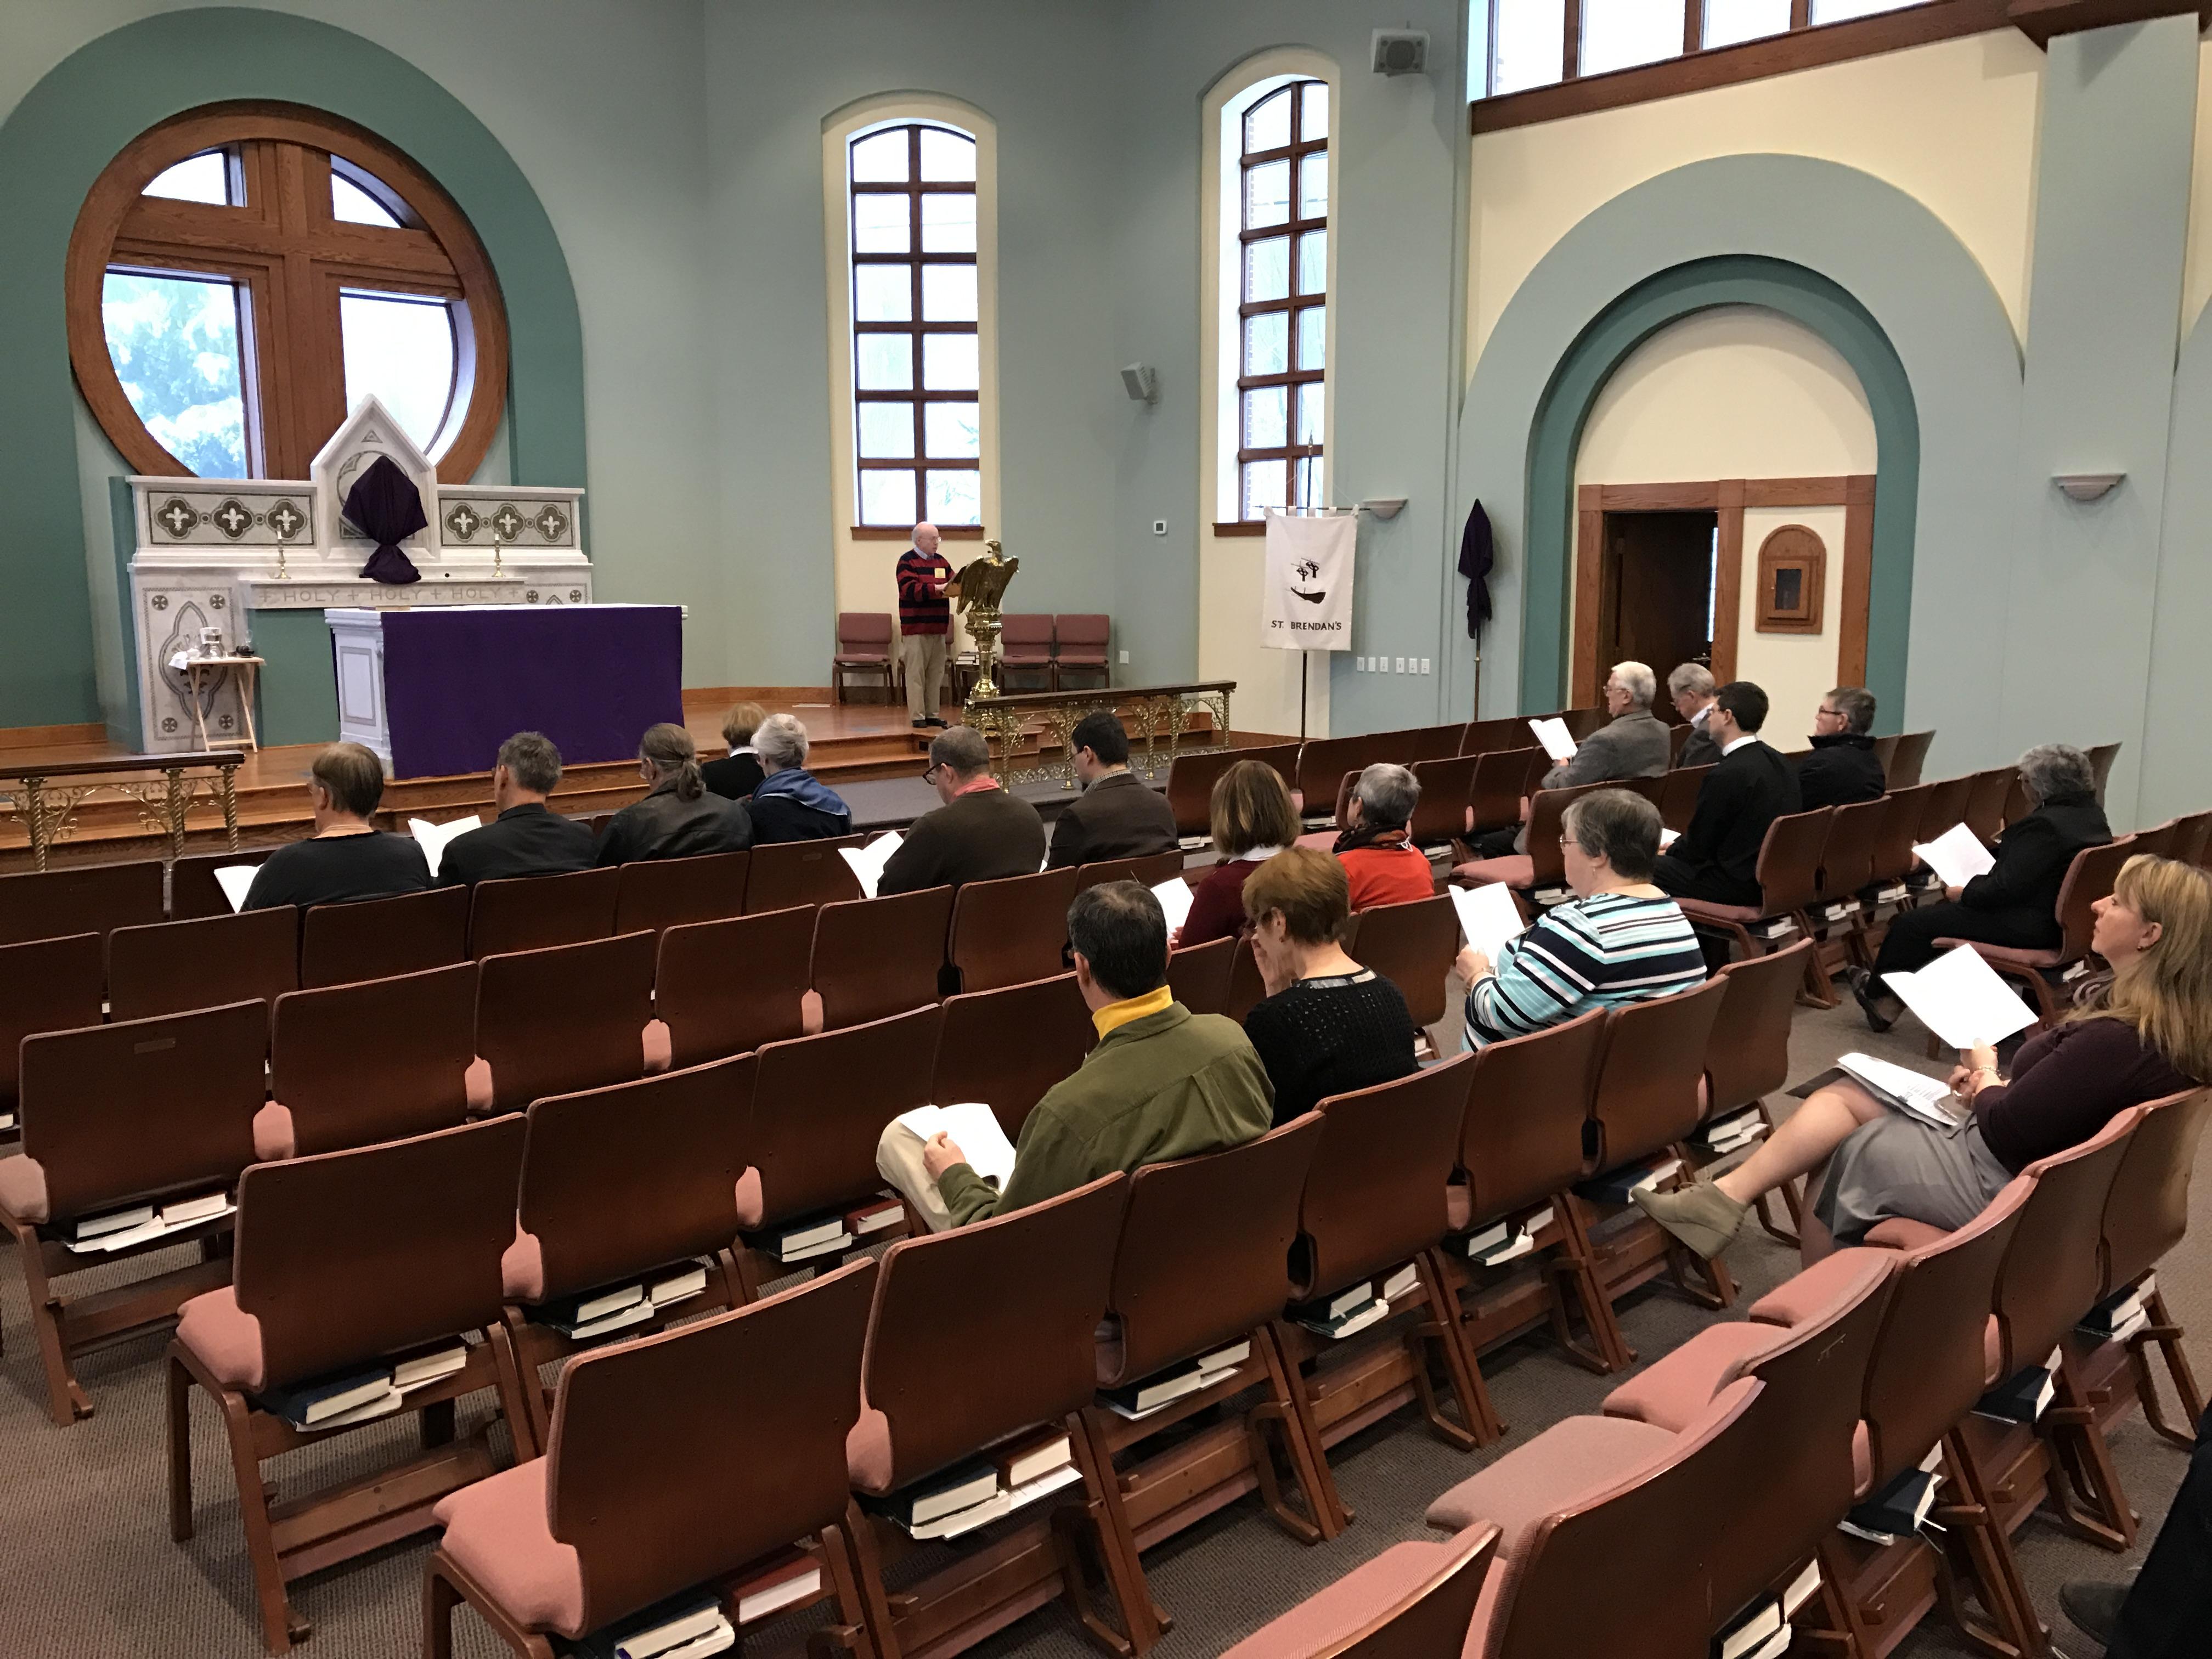 Evangelism Conf 2017 - group